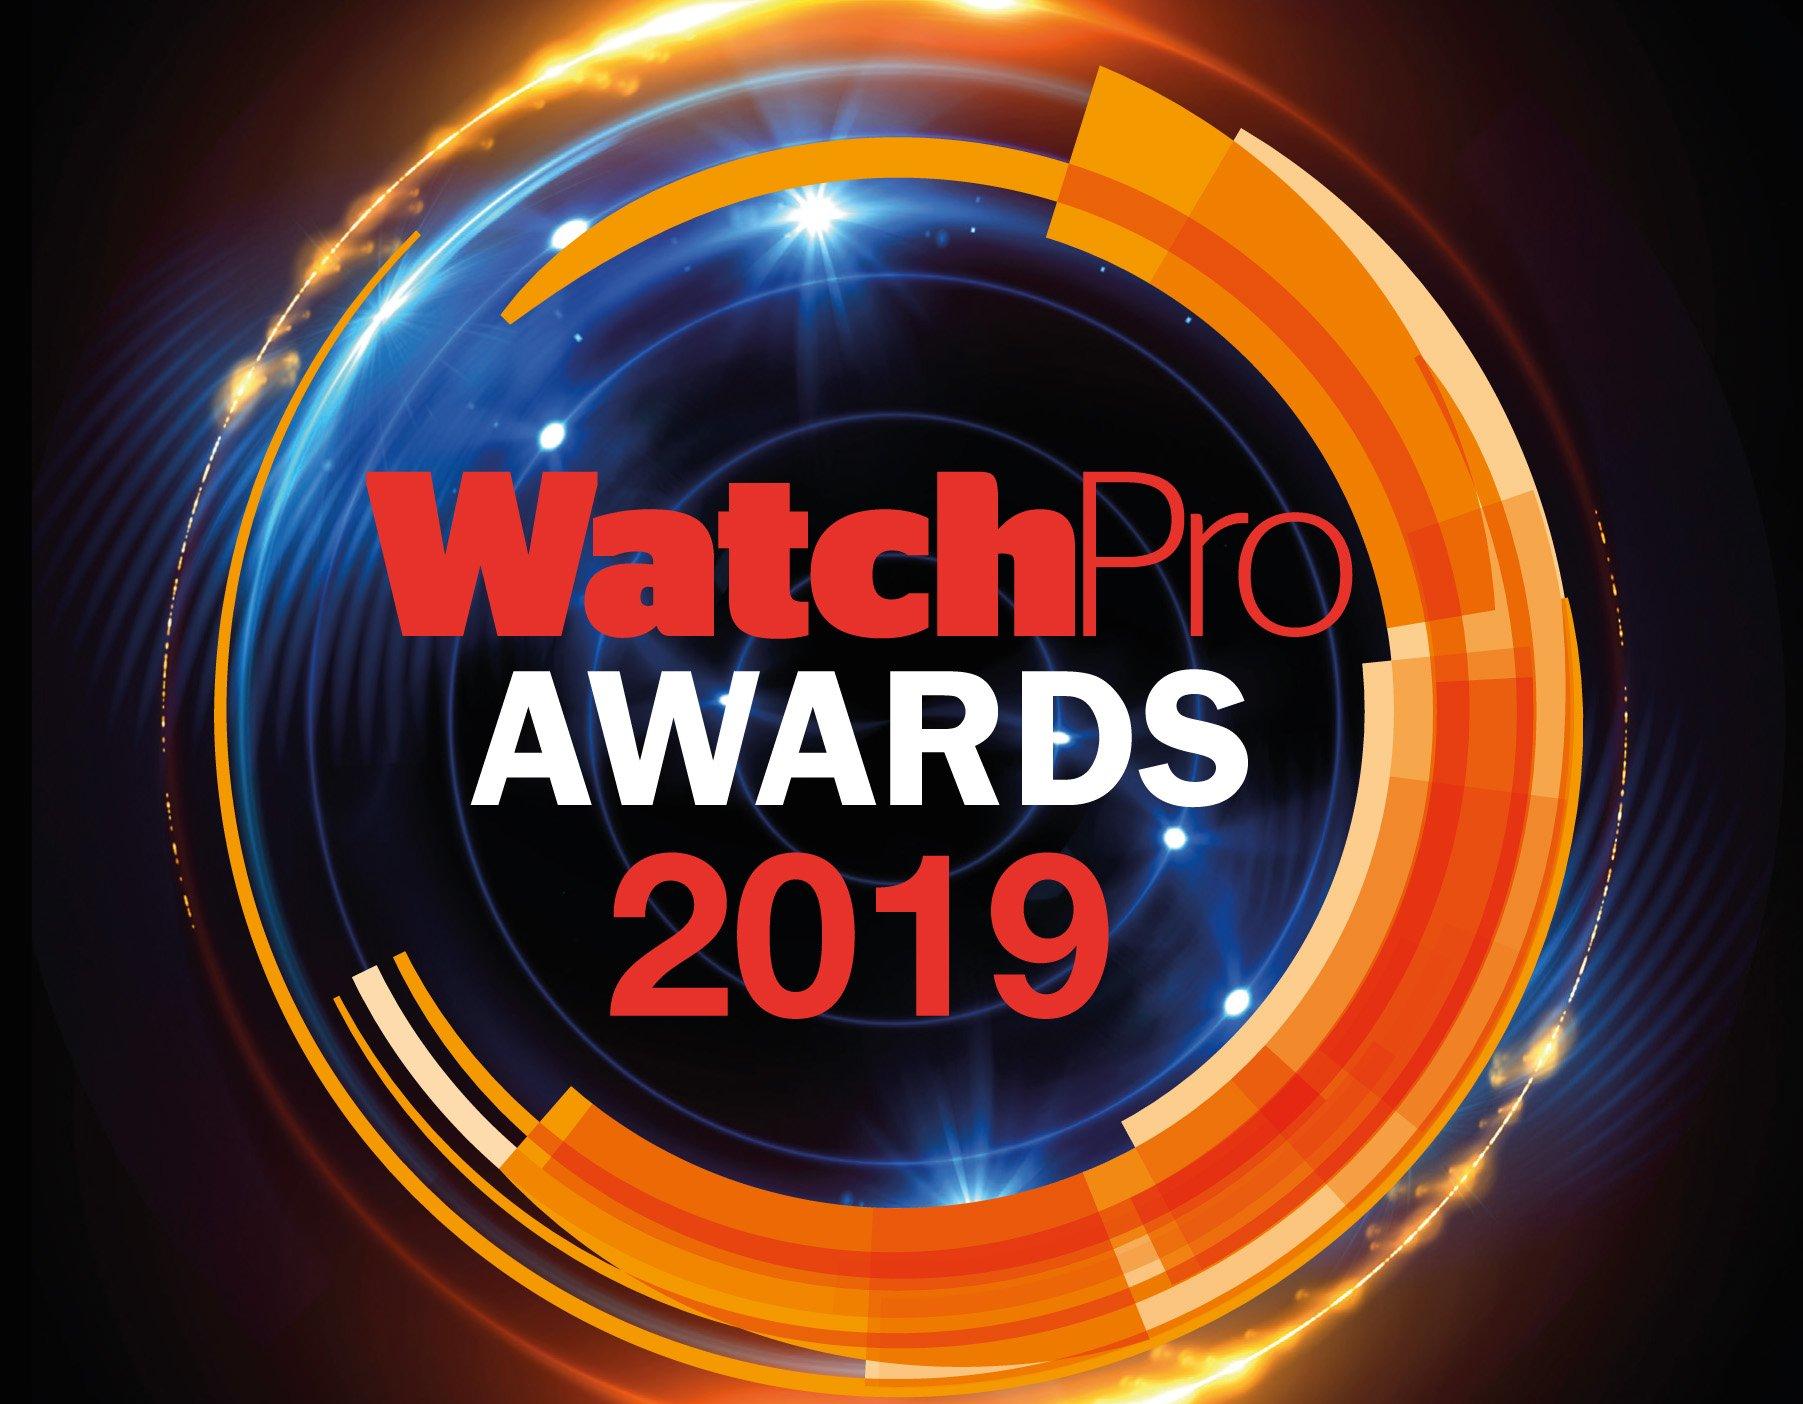 WatchPro Awards 2019